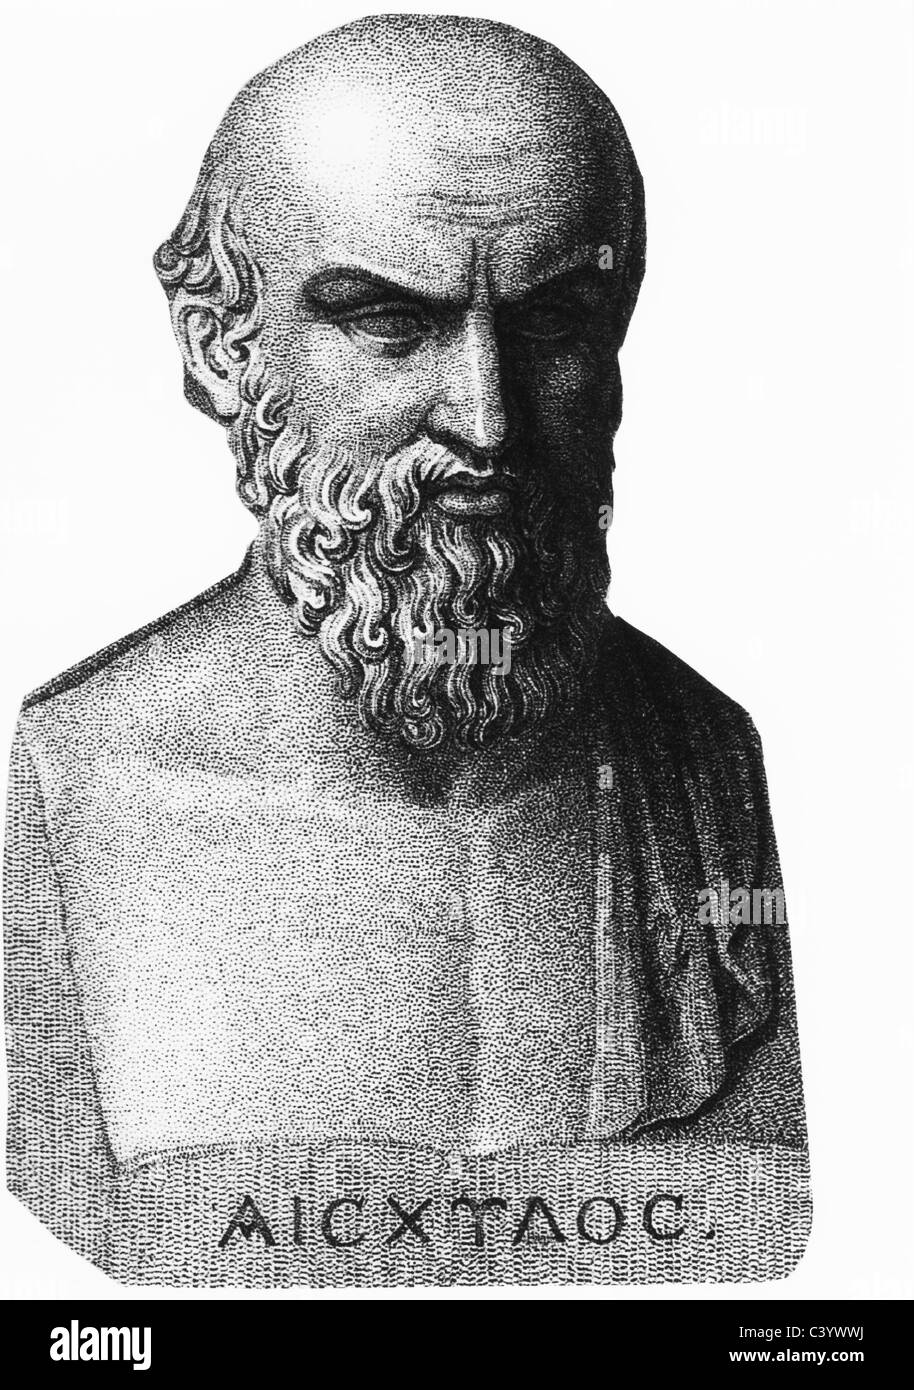 AESCHYLUS Greek tragedic playwright - Stock Image